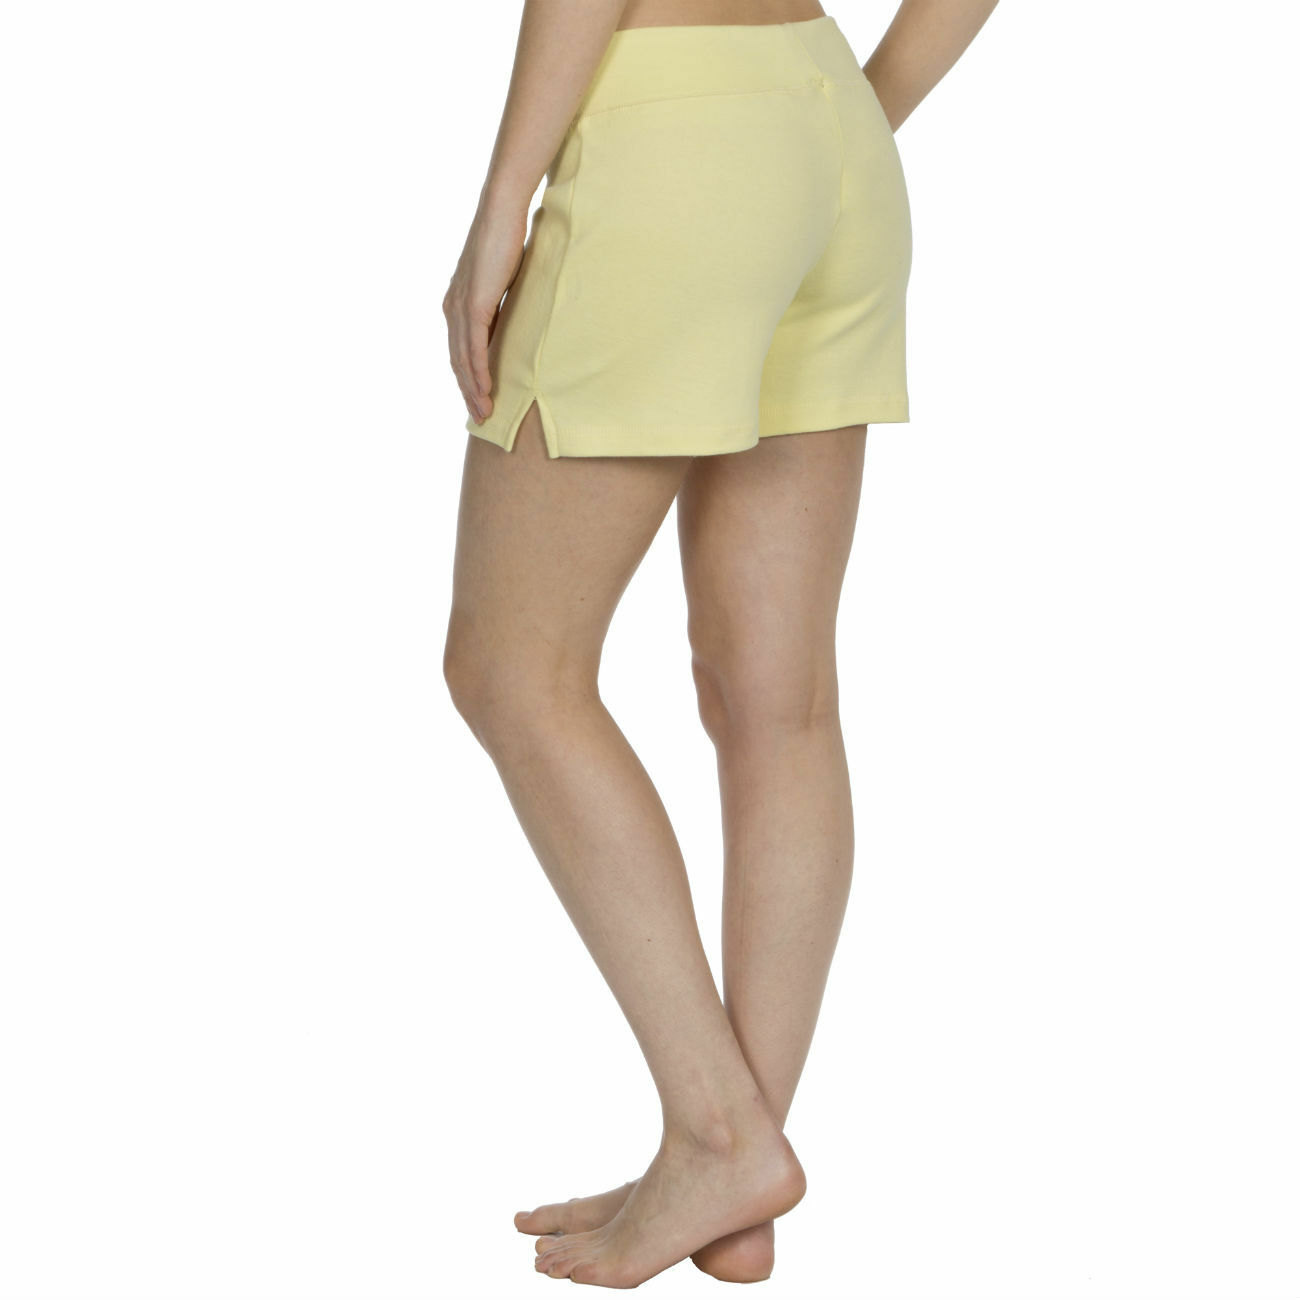 Womens-Cotton-Jersey-Shorts-Elastic-Waist-Summer-Beach-Casual-Yoga-Hot-Pants-New thumbnail 41